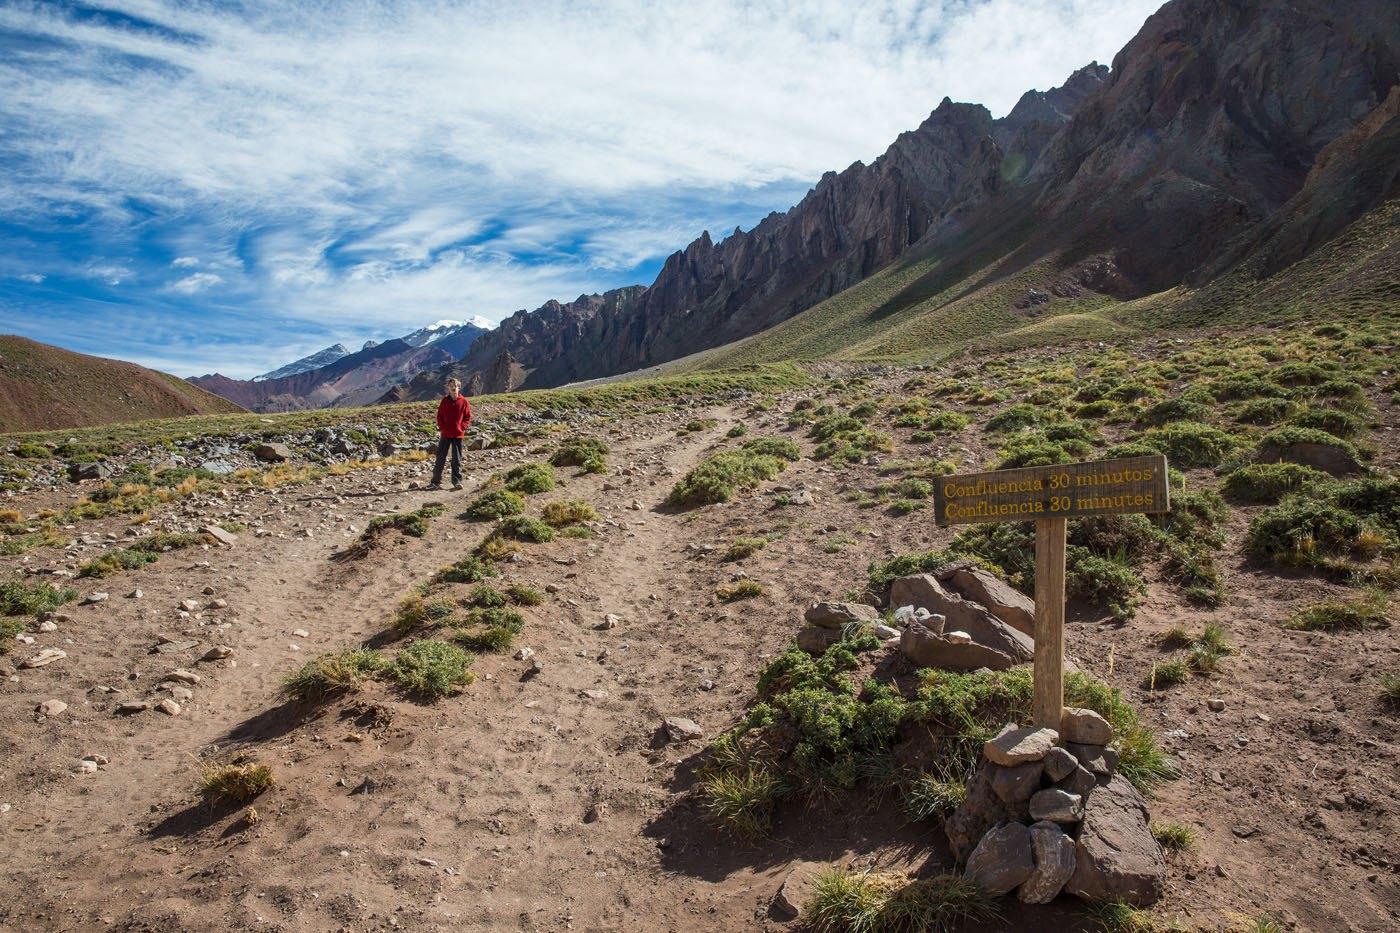 Hiking to Aconcagua Confluencia